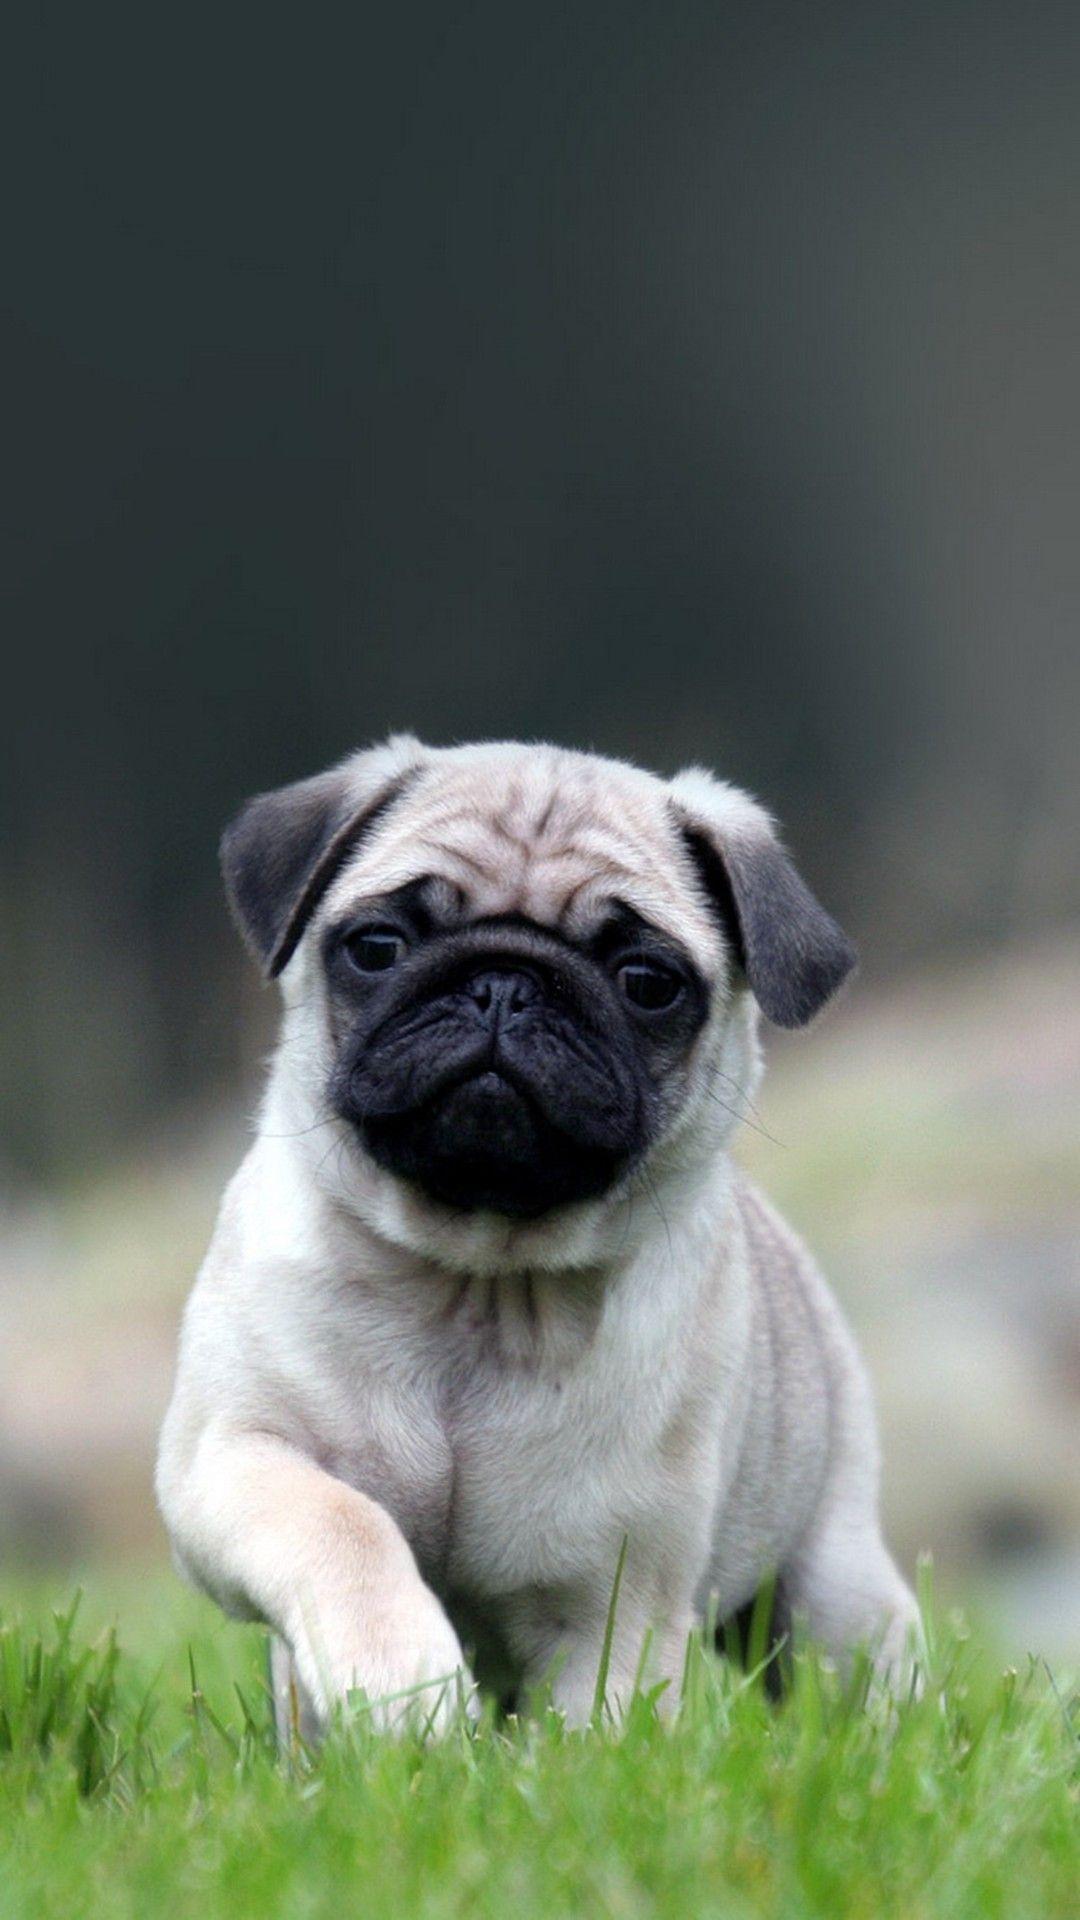 Pin By Alicia Dobrowski On Animals Dog Wallpaper Pug